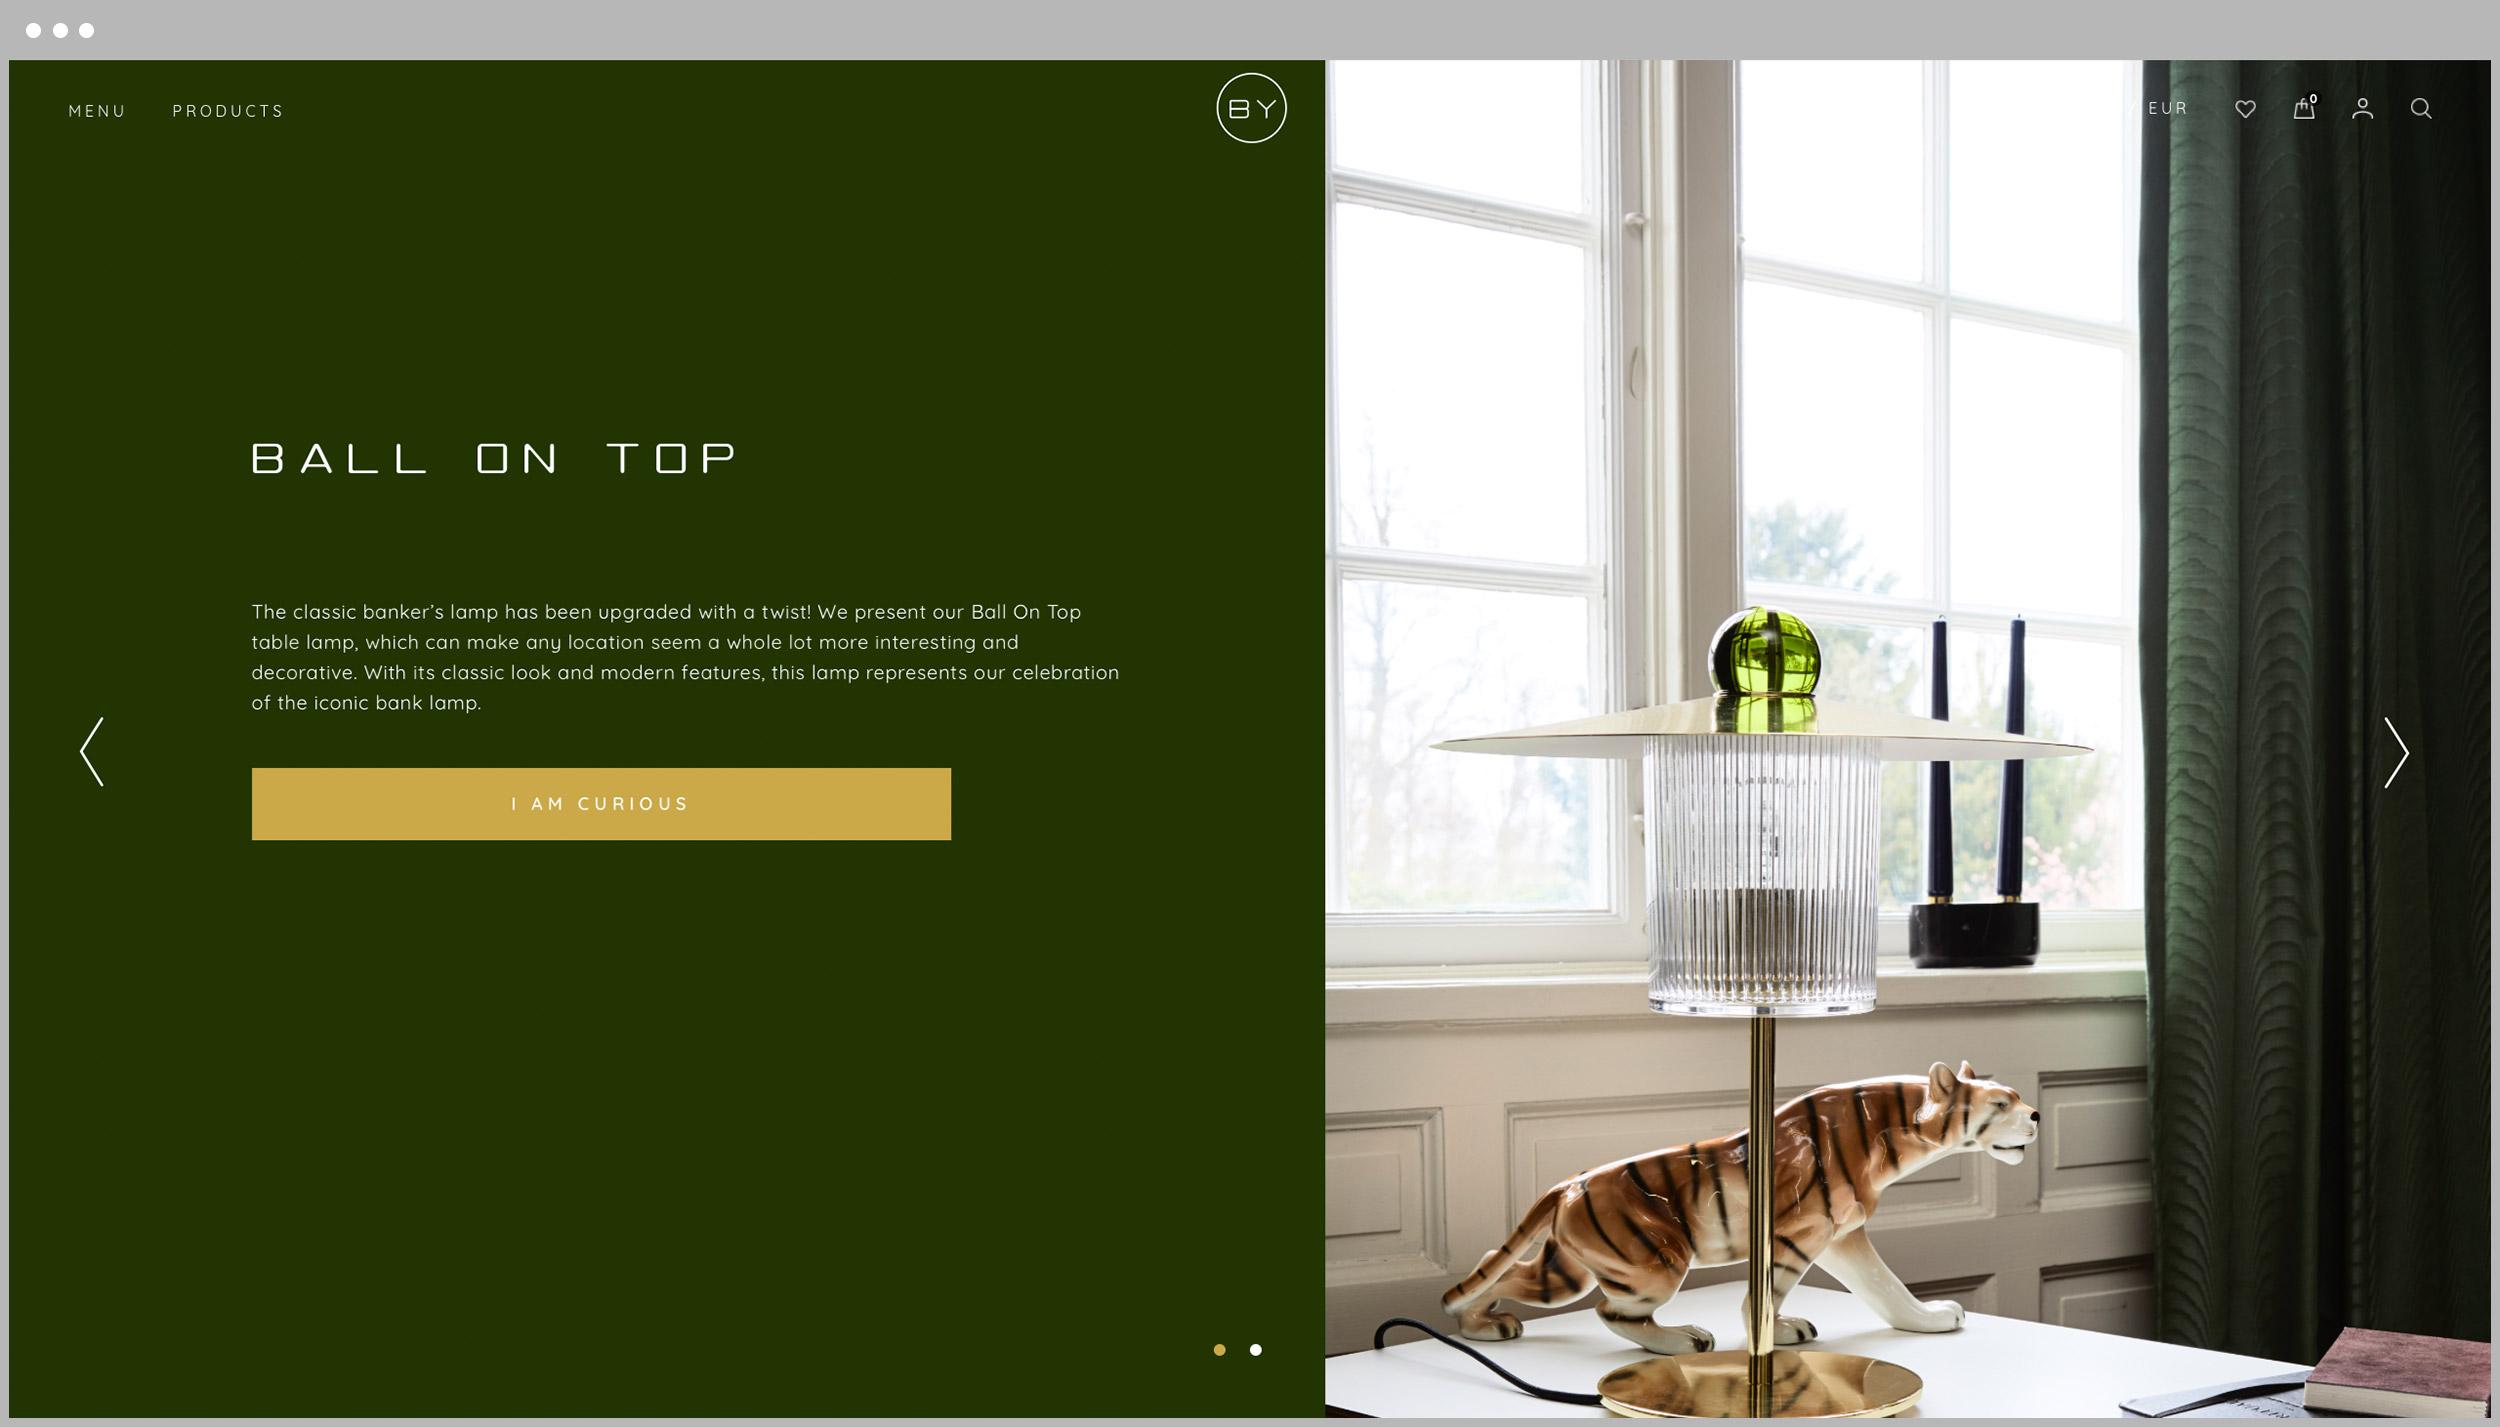 Design Bank Twist.Design By Us Phillip Bjorvig